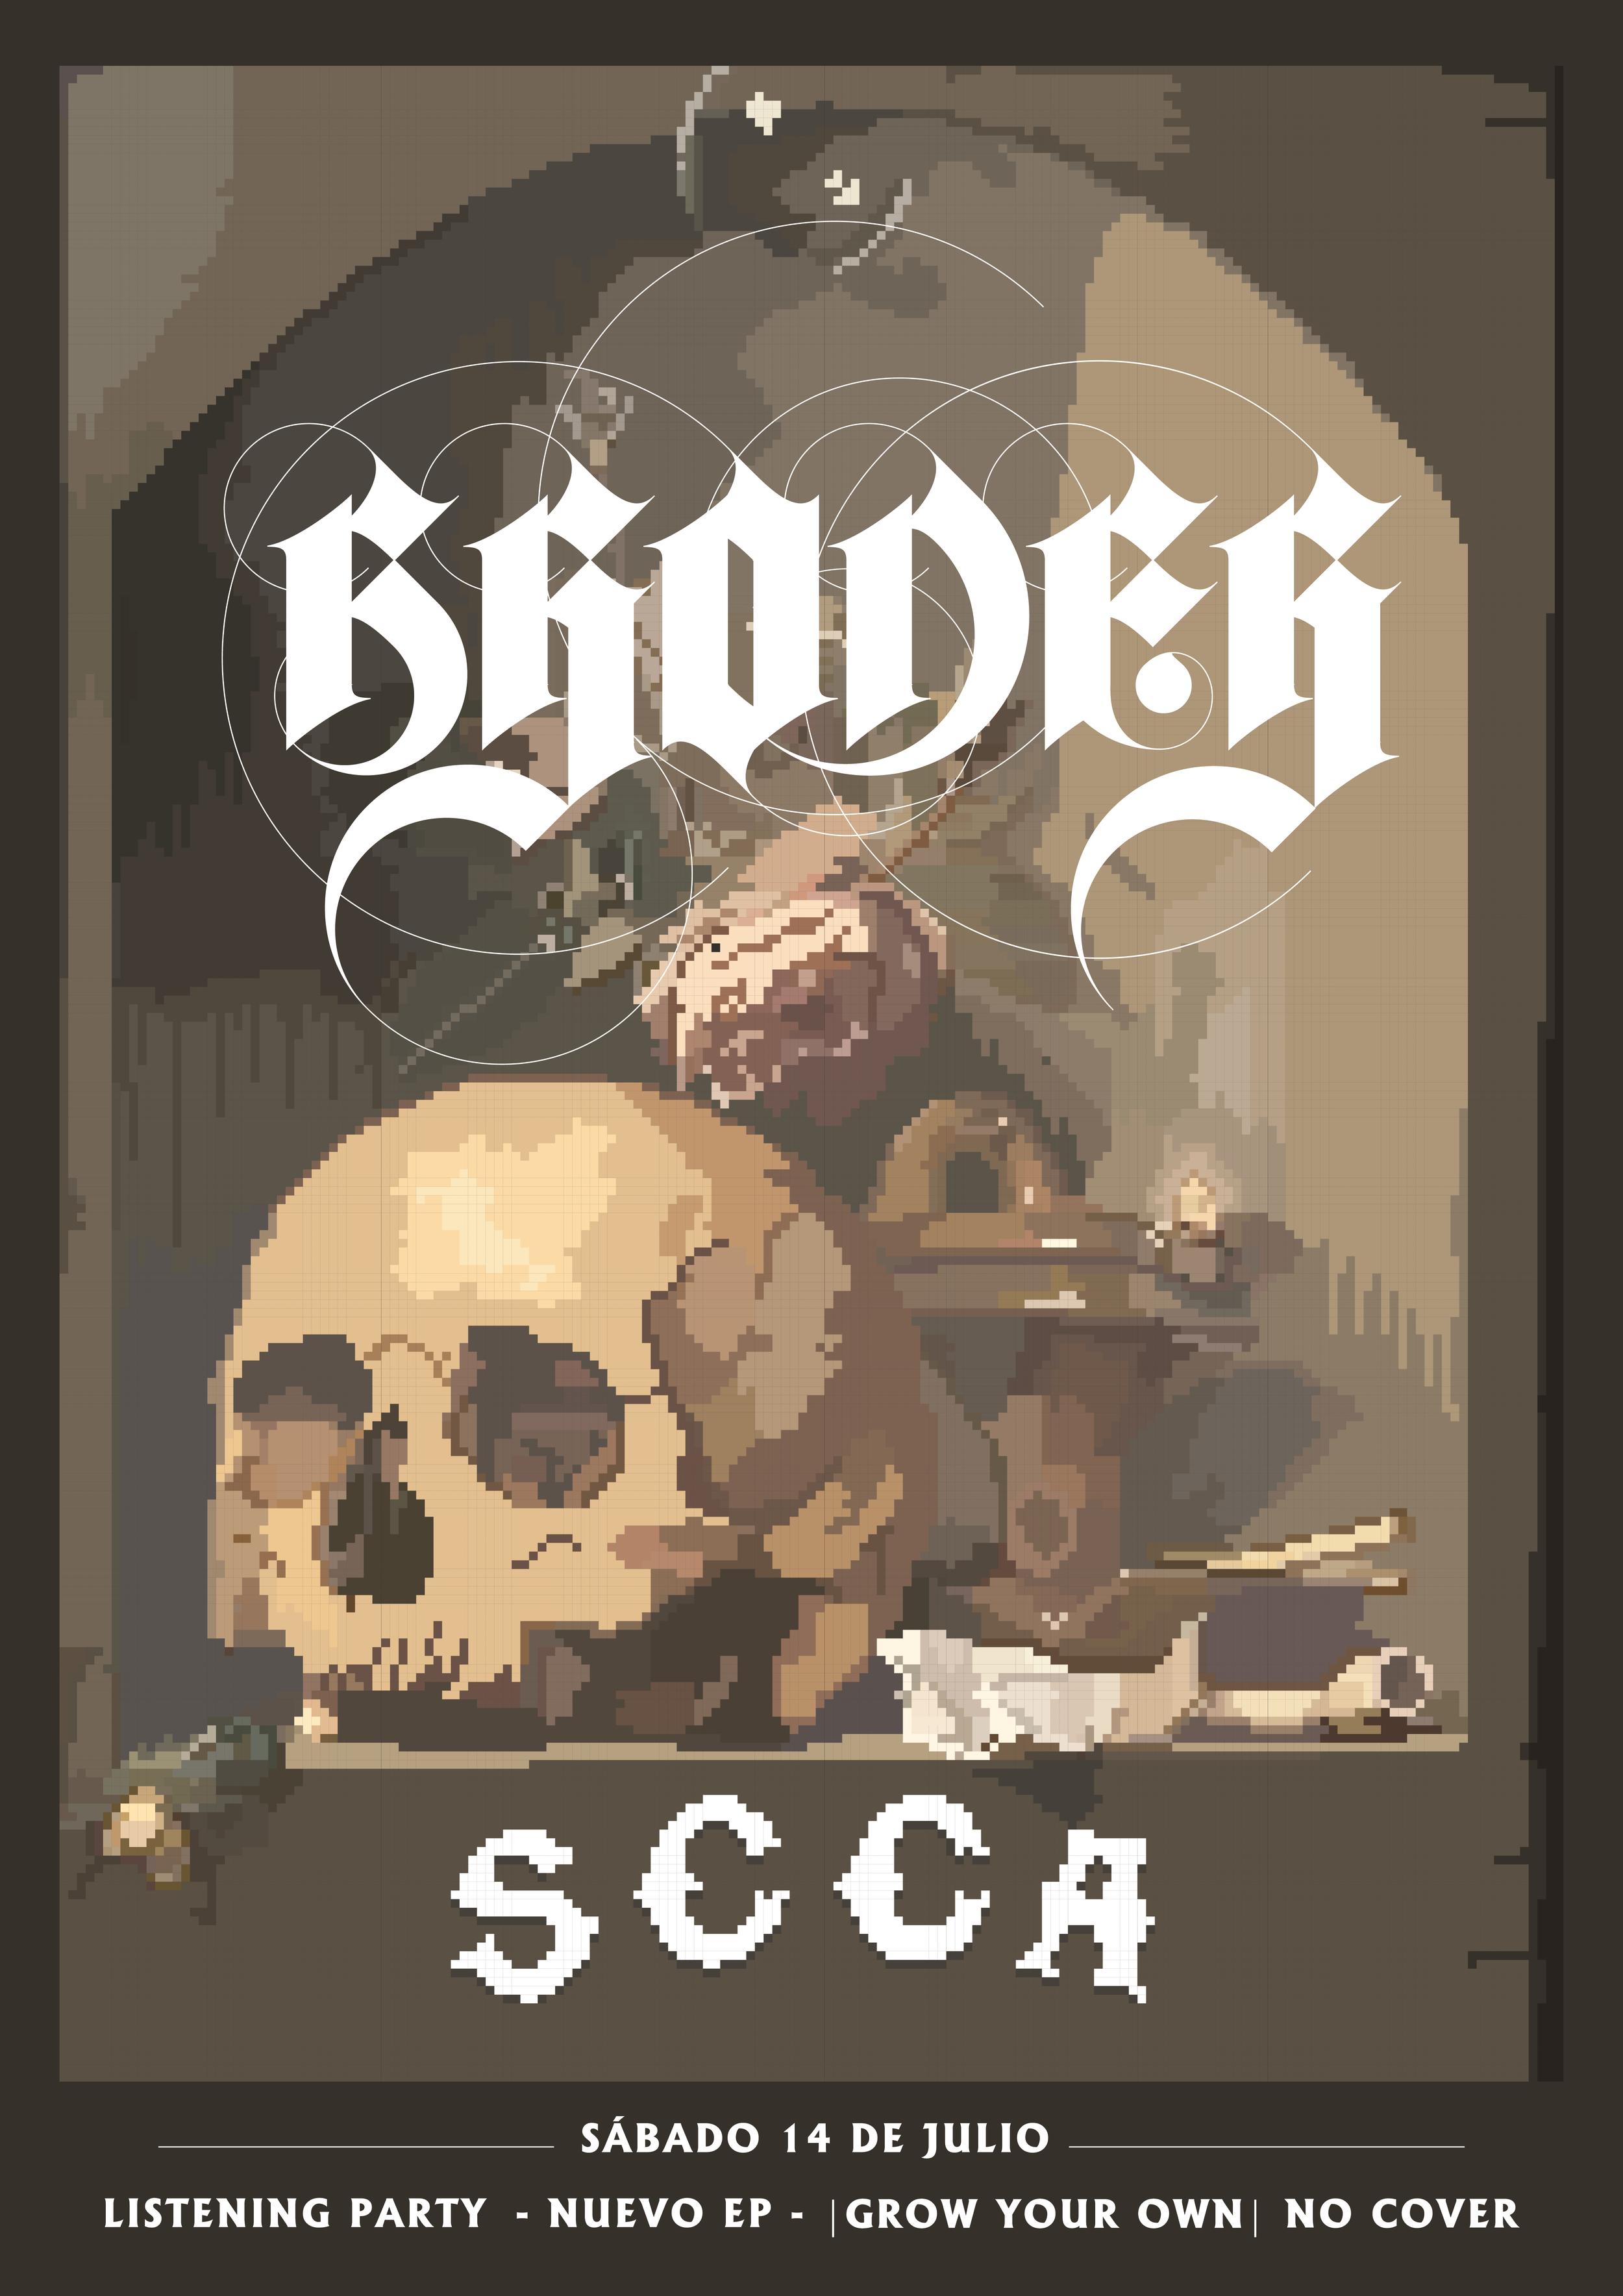 broder-01.png